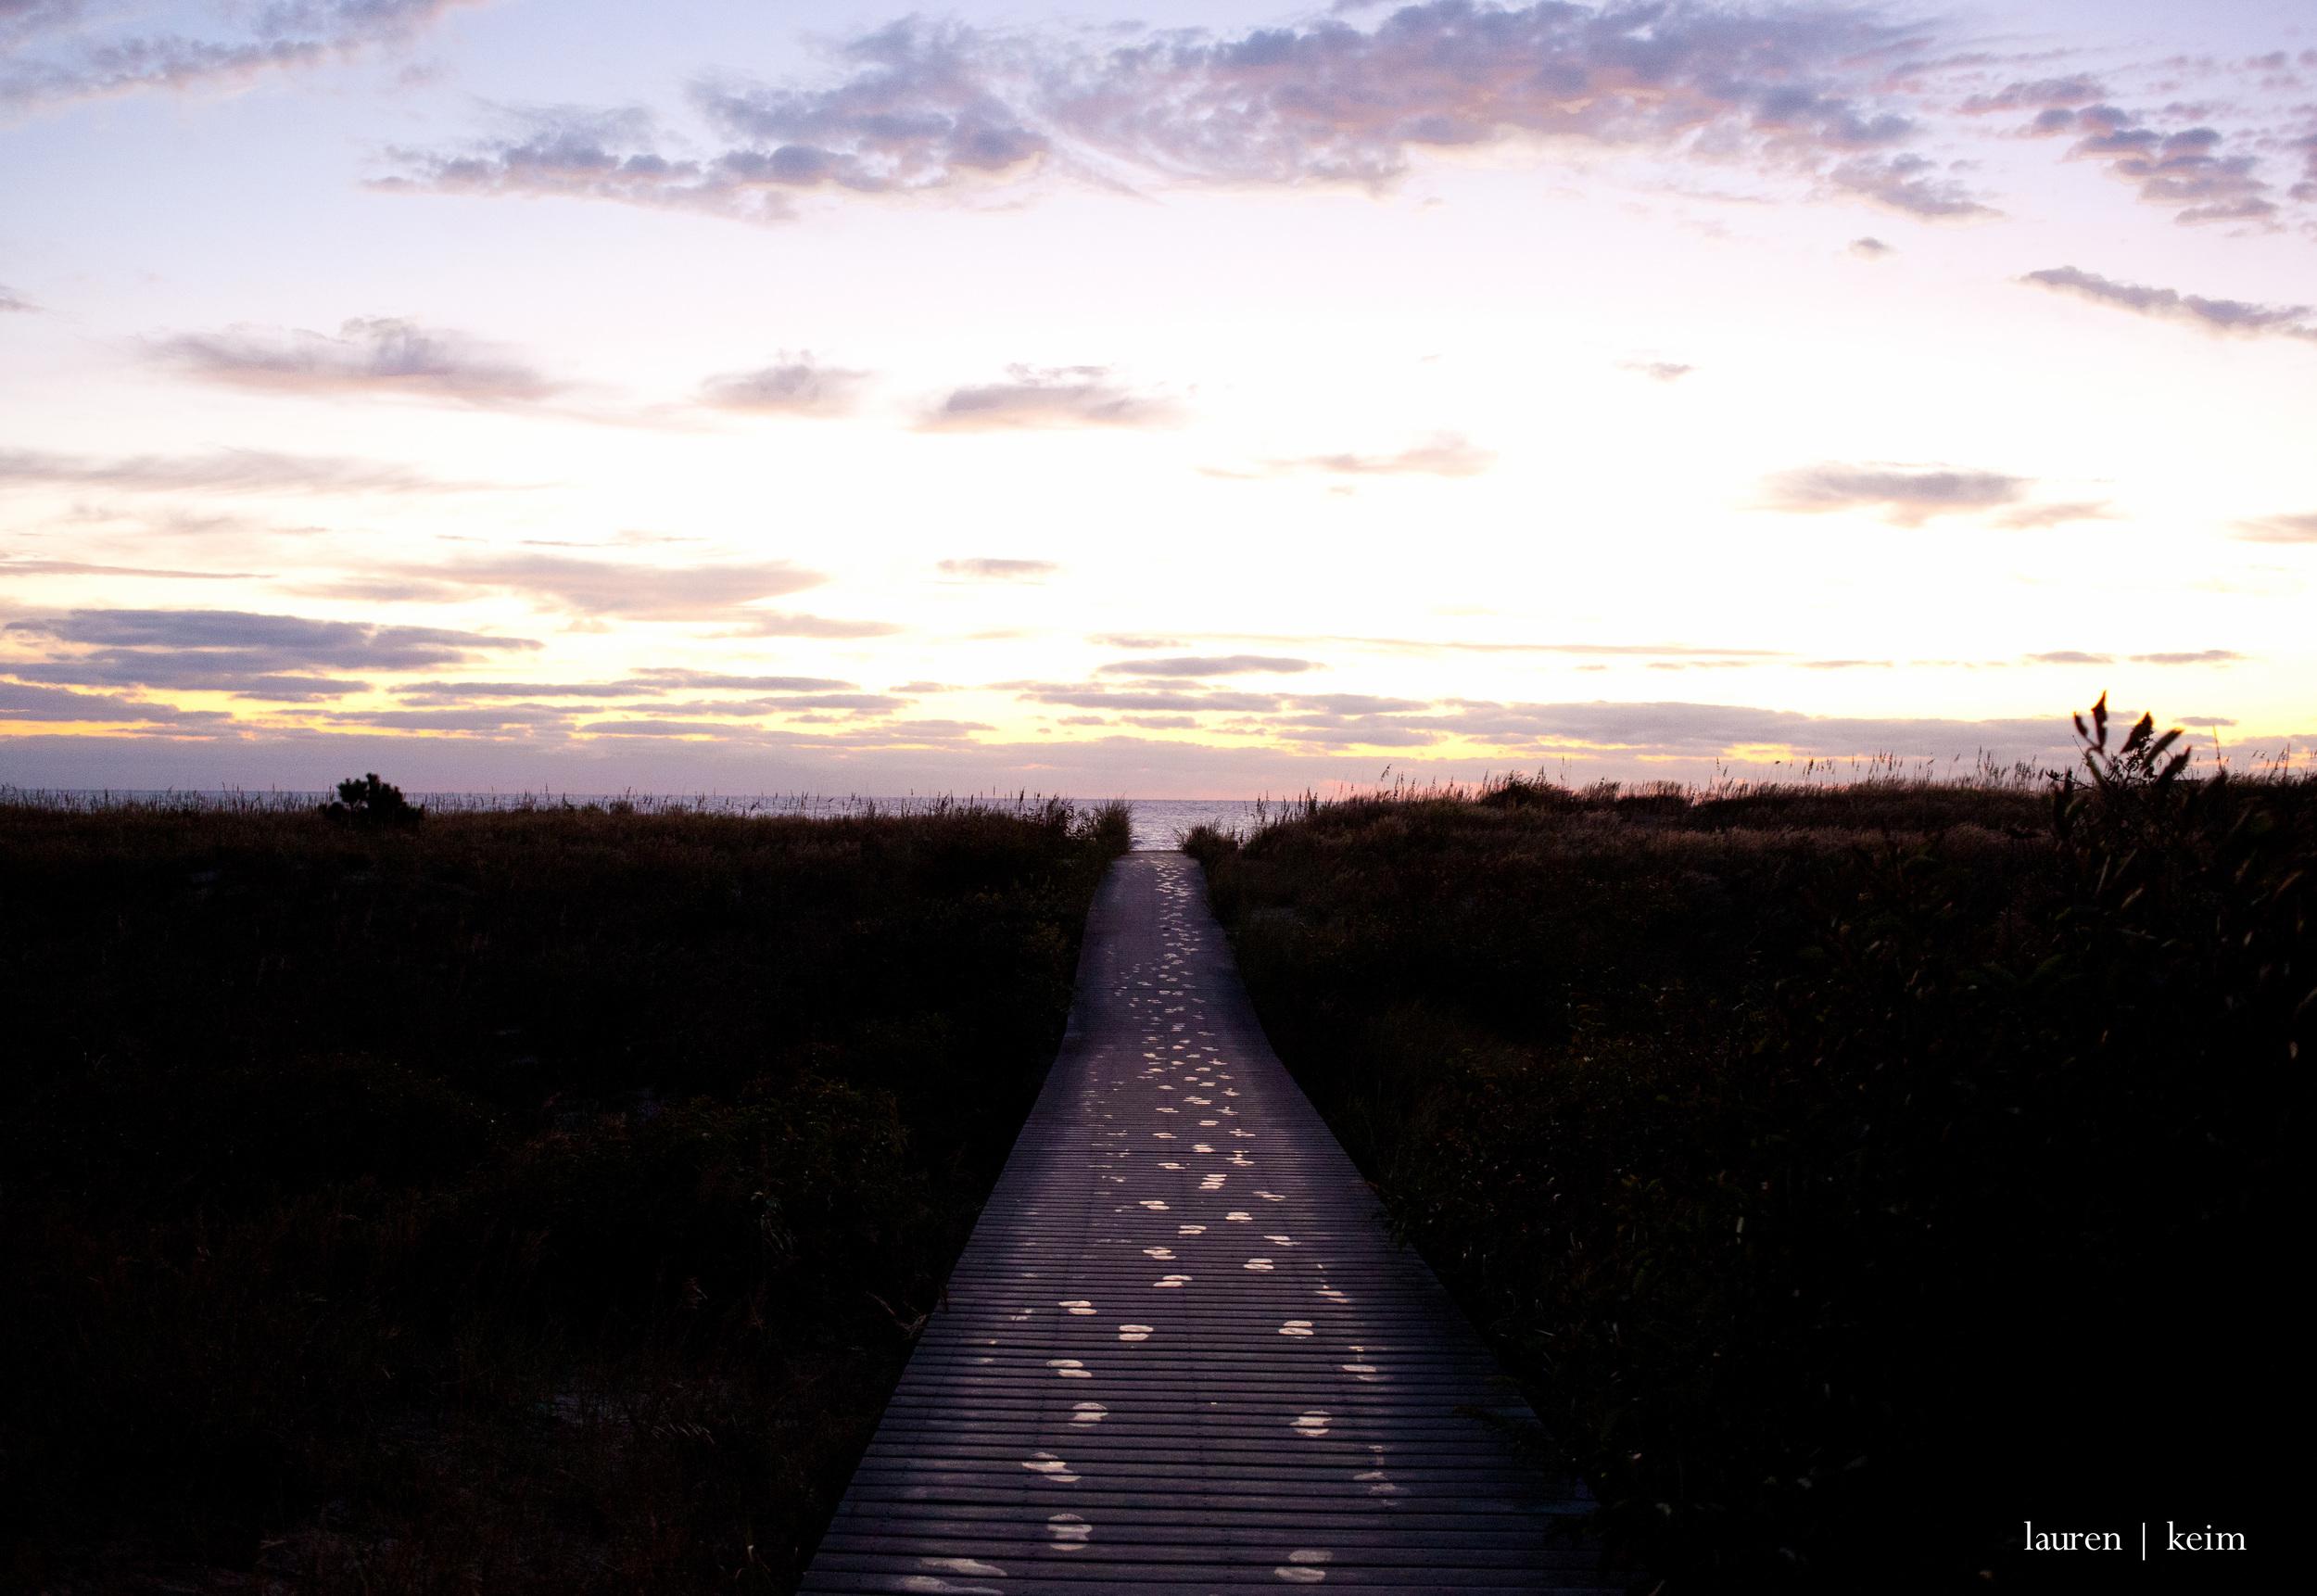 footpath :: Canon 5D MII, 35mm